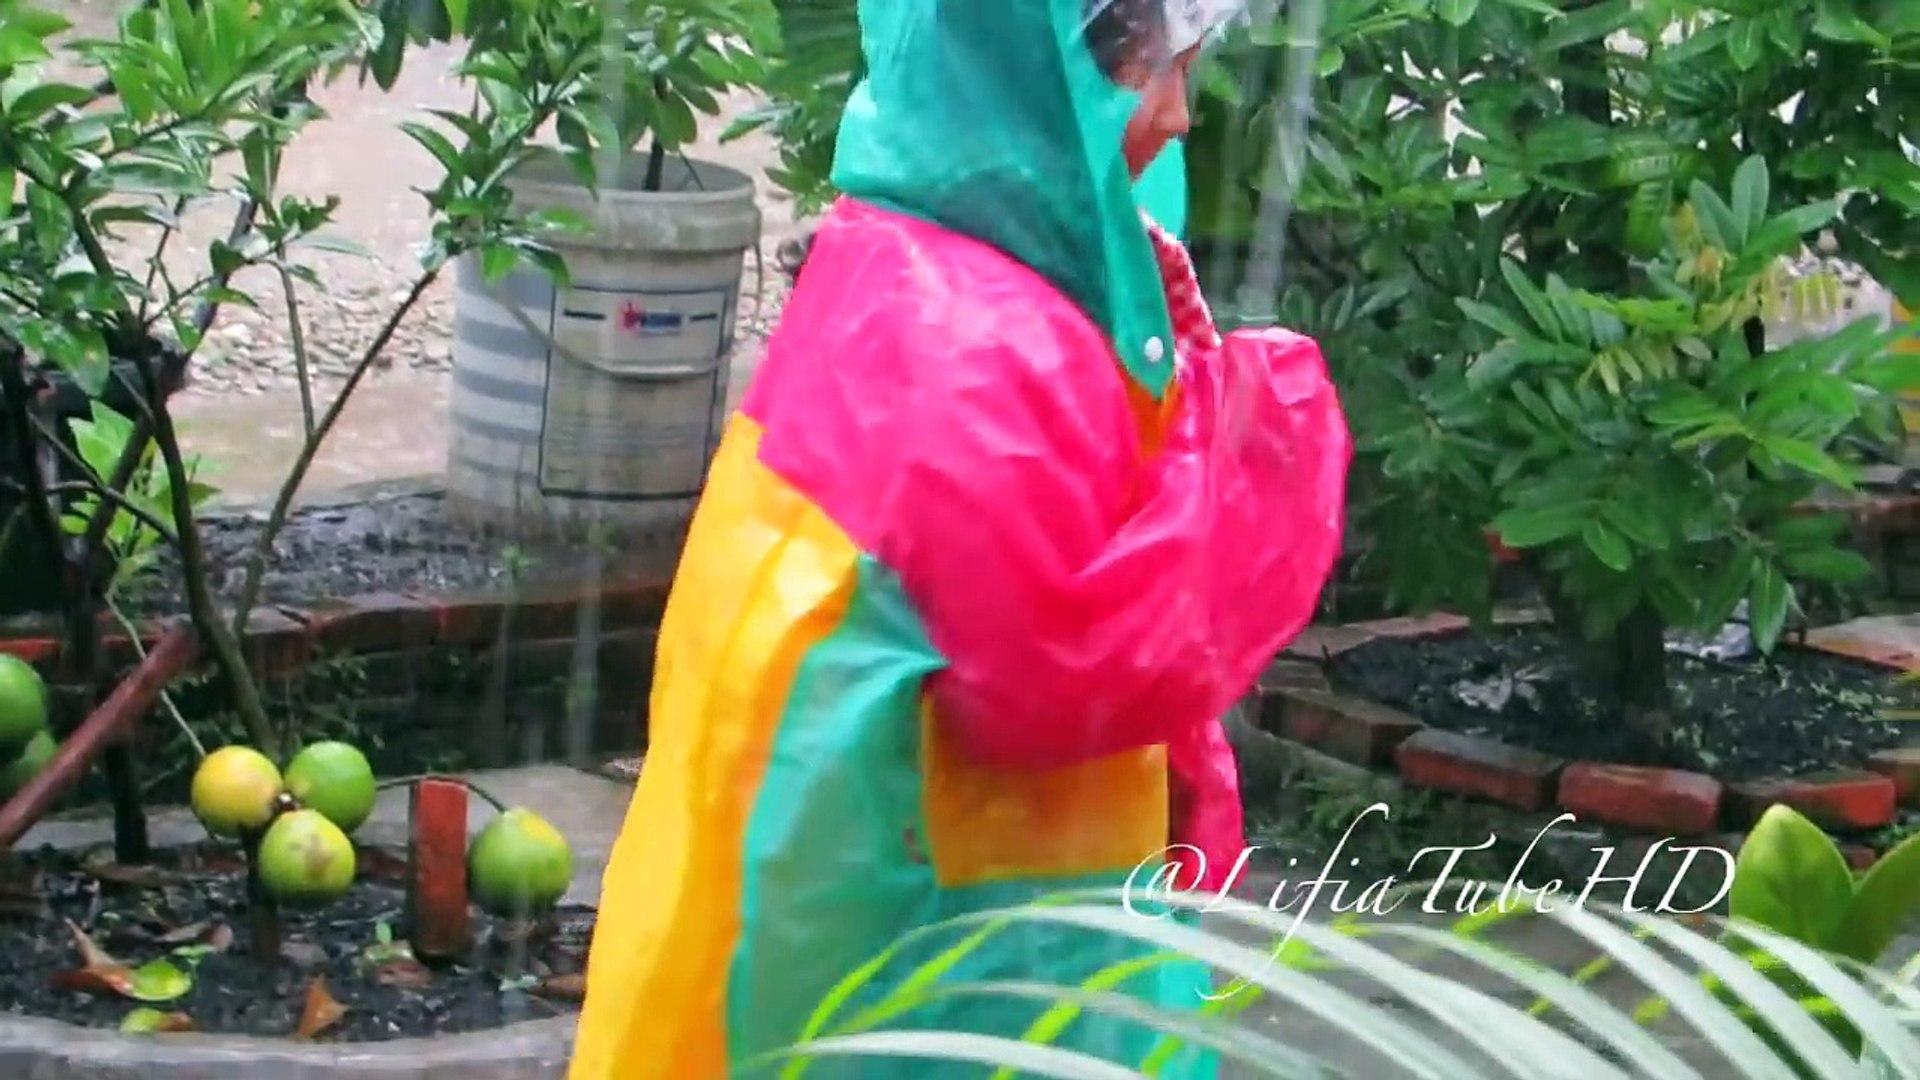 Anak Kecil Asik Mandi Hujan ❤ Happy Rain Day Kids - Kids Activities